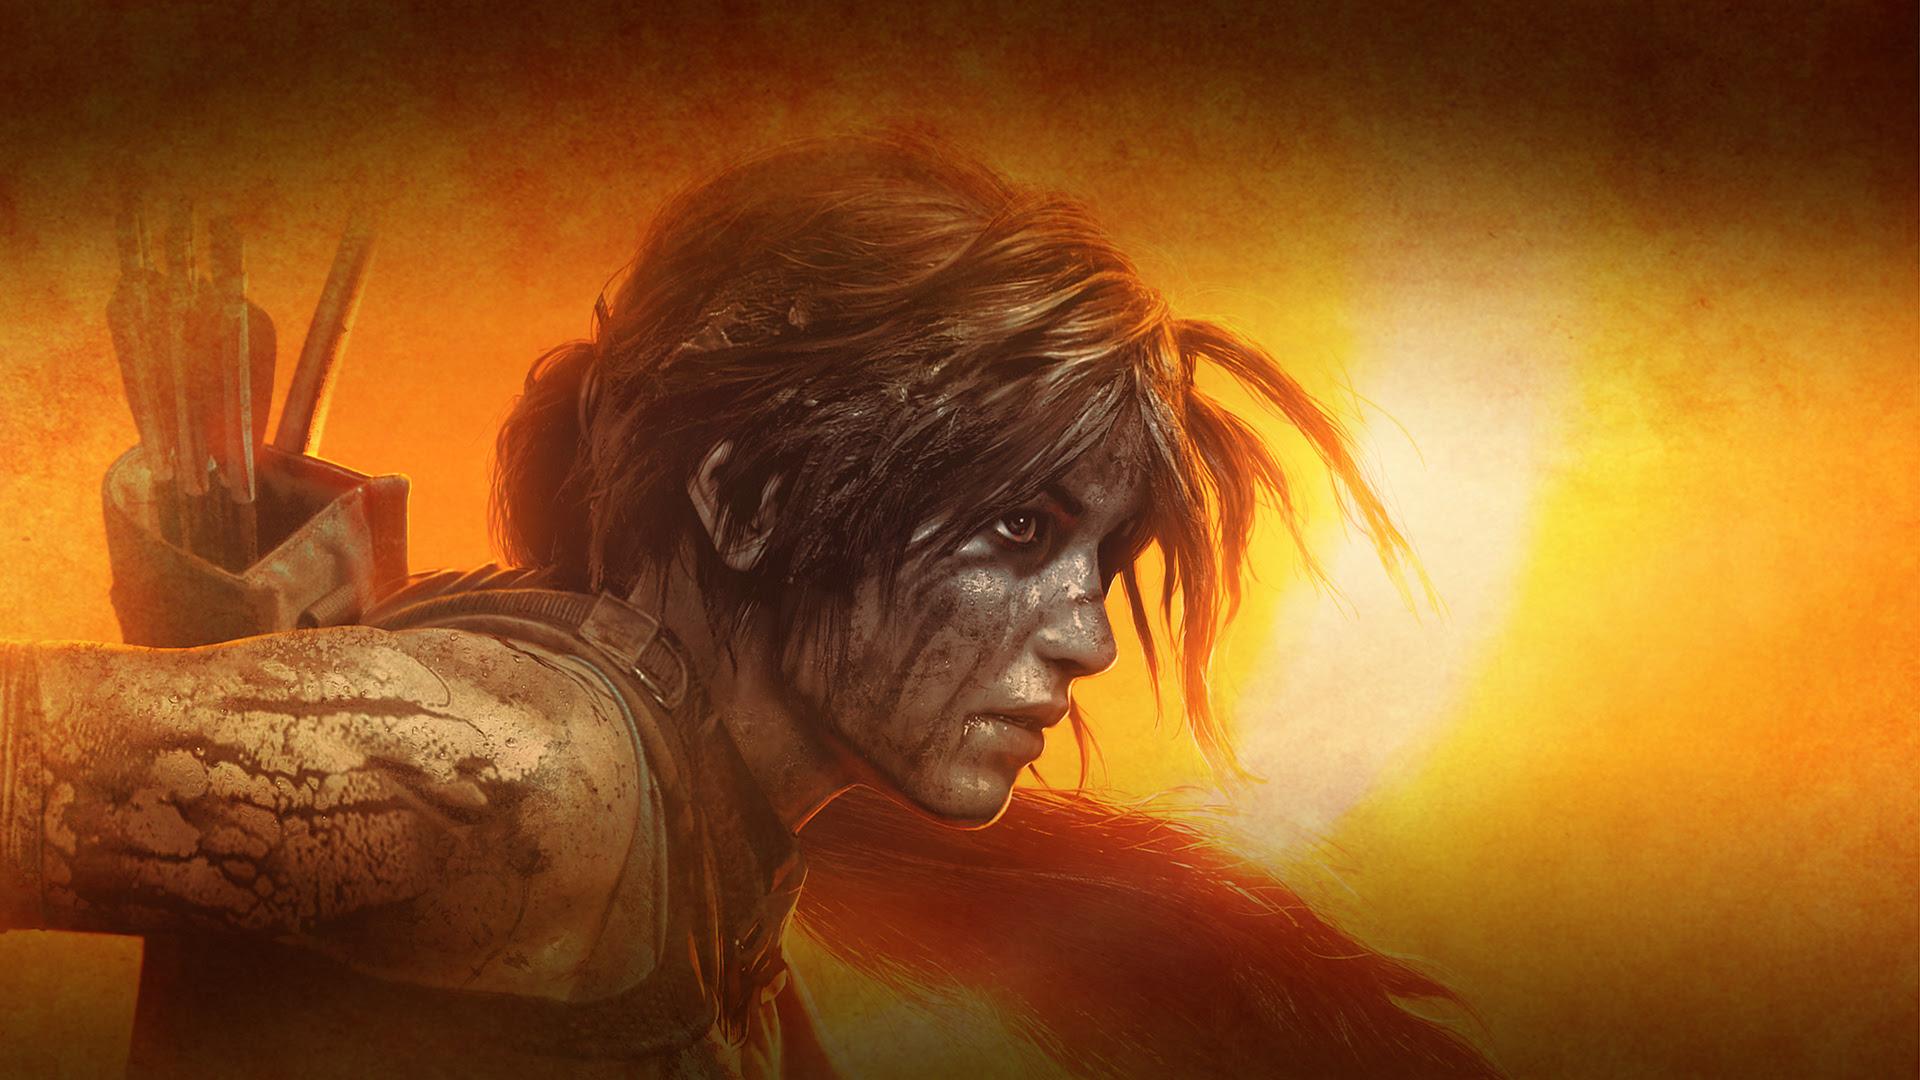 Lara Croft In Shalara Croft In Shadow Of The Tomb Raider